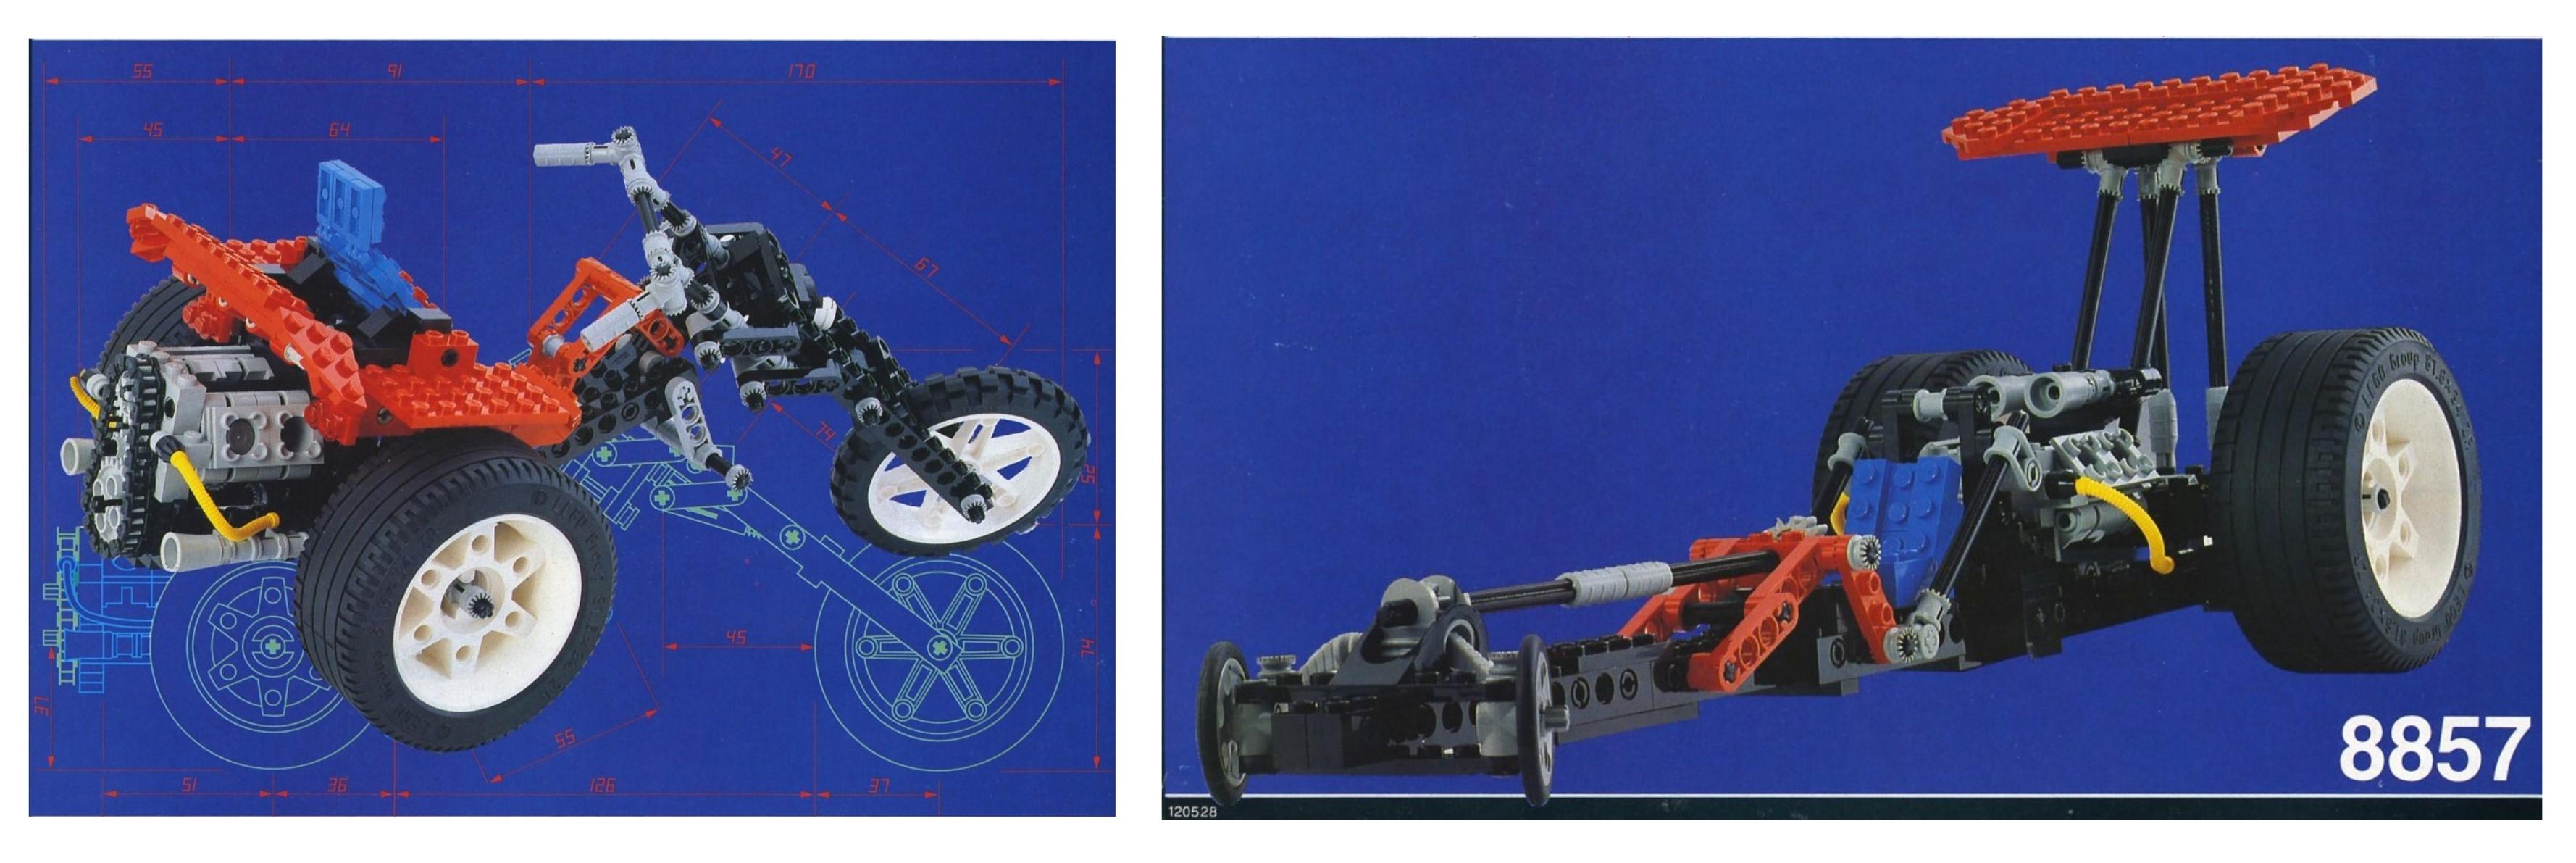 LEGO Technic Motorcycles street chopper